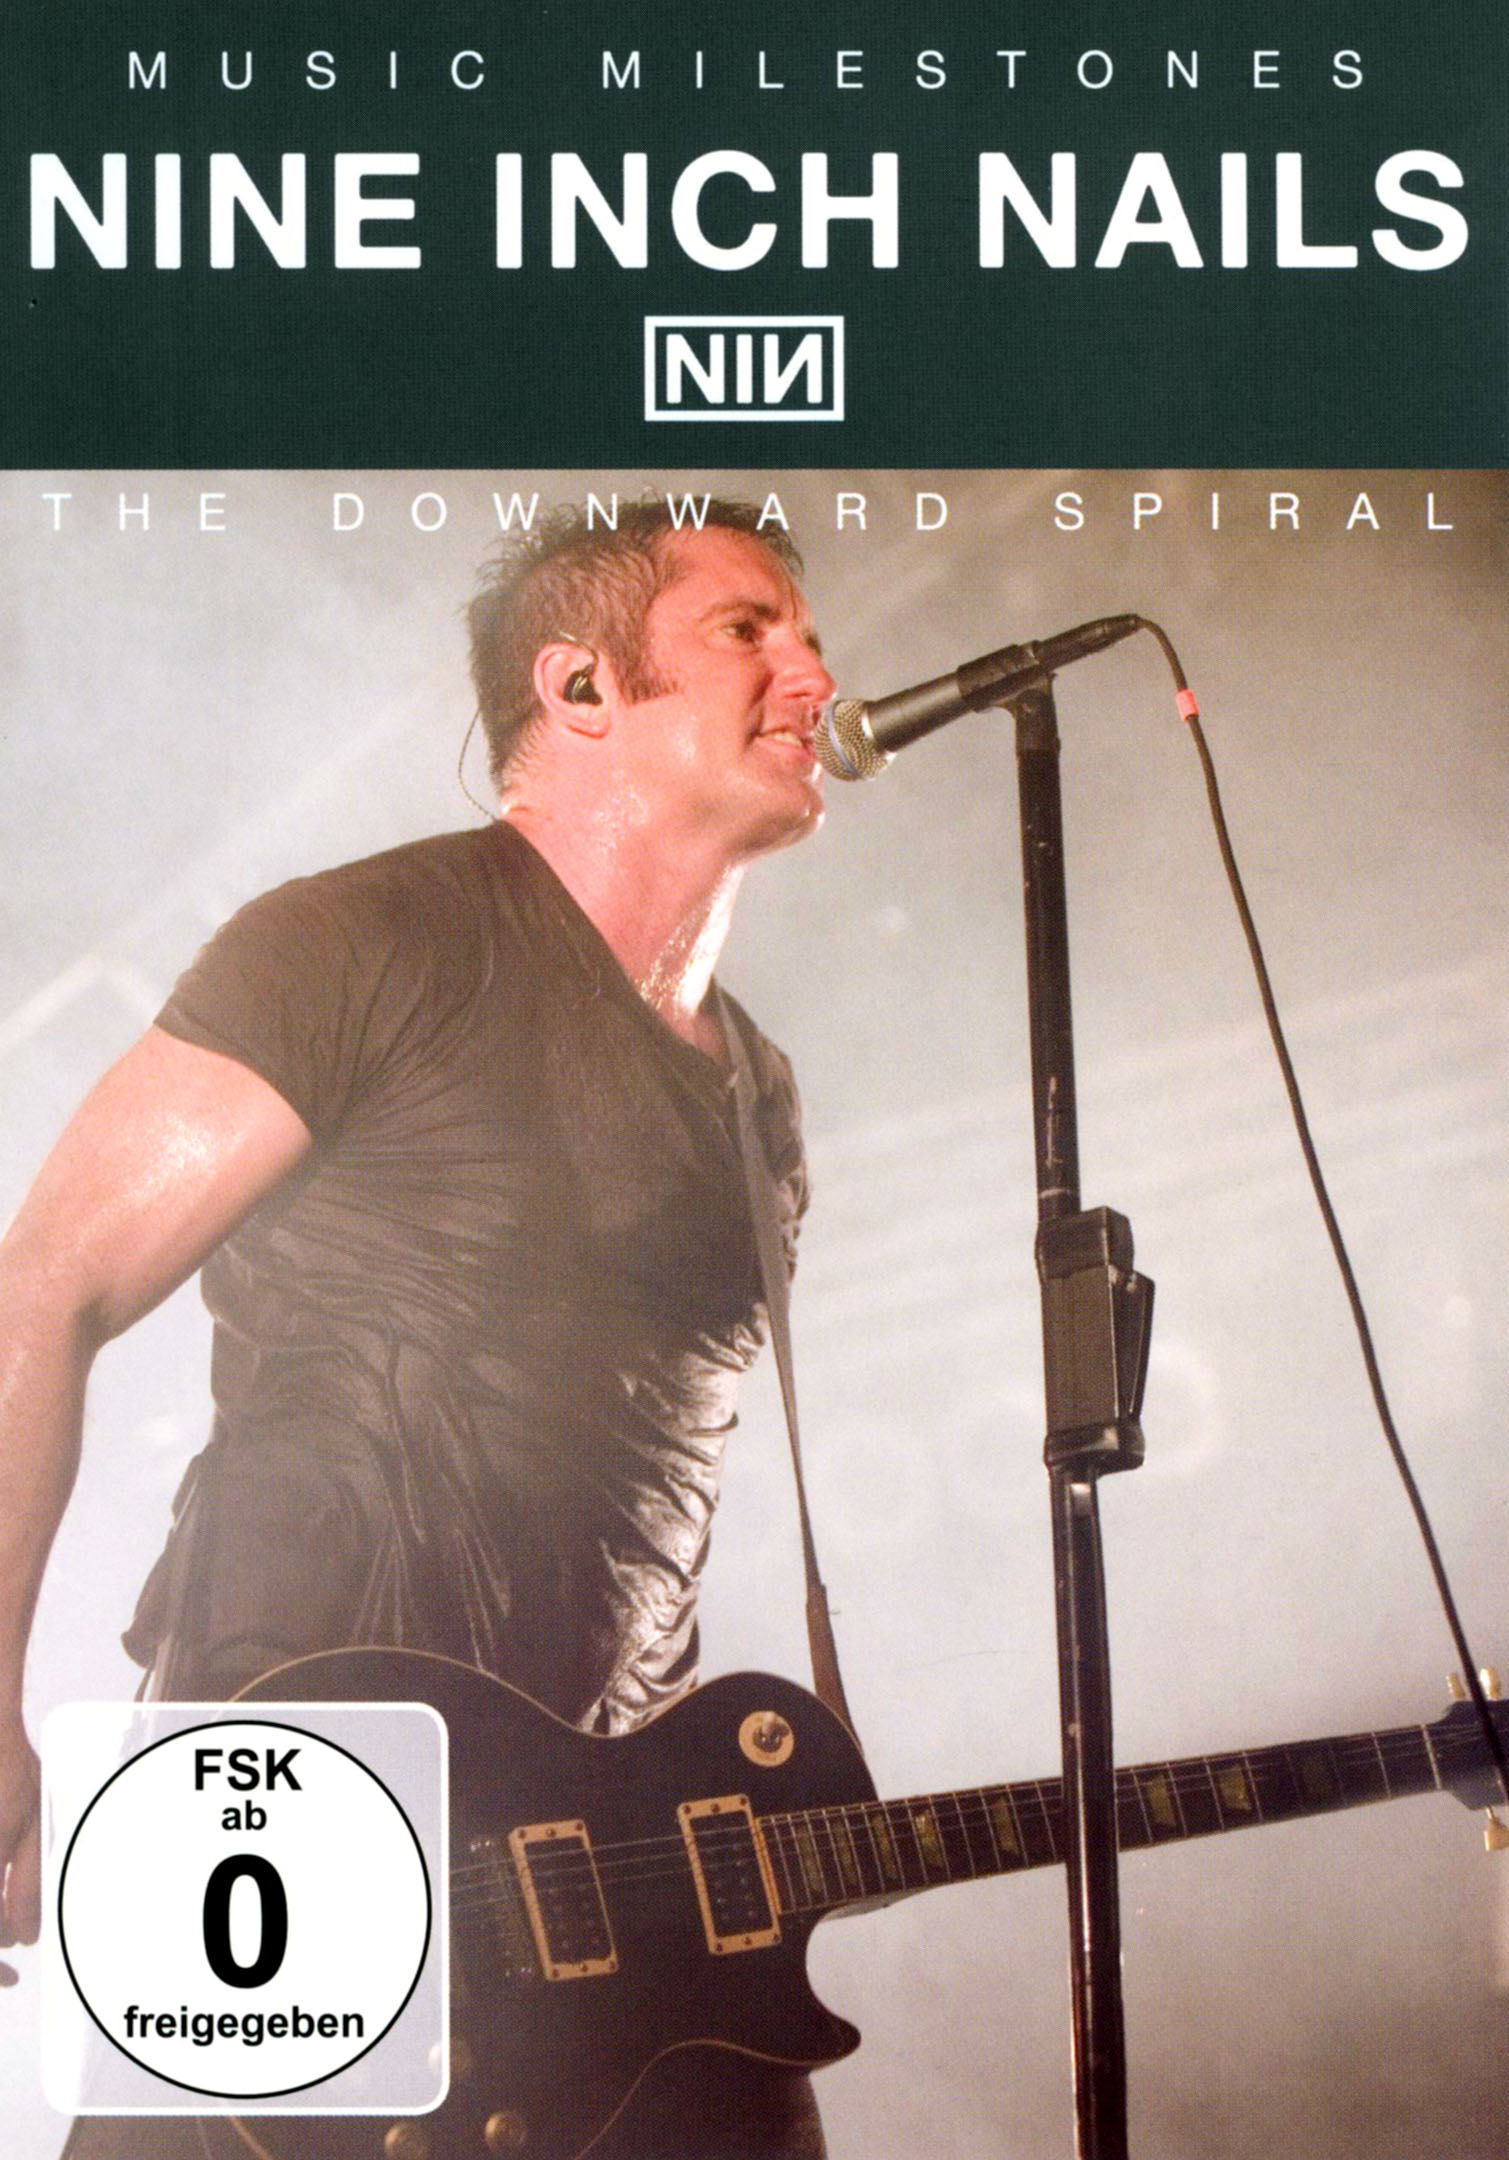 nine inch nails music milestones downward spiral 2011